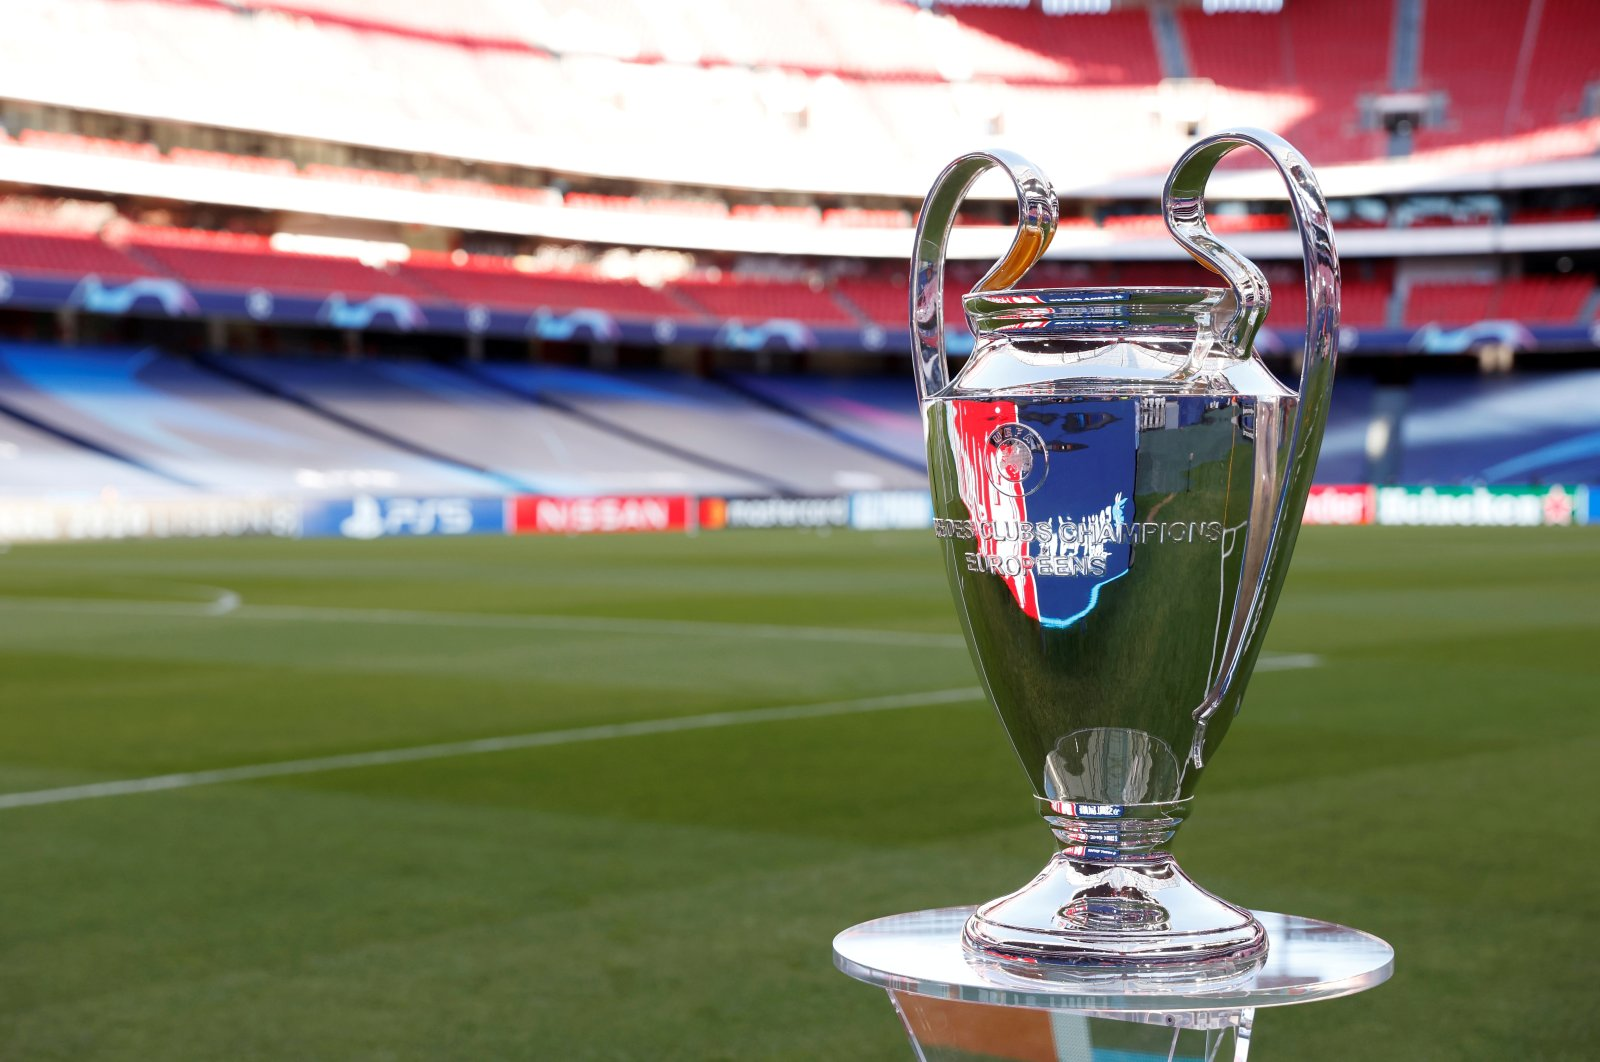 The Champions League trophy is seen before the 2020 final between Bayern Munich and Paris Saint-Germain, Estadio da Luz, Lisbon, Portugal, Aug. 23, 2020. (REUTERS Photo)